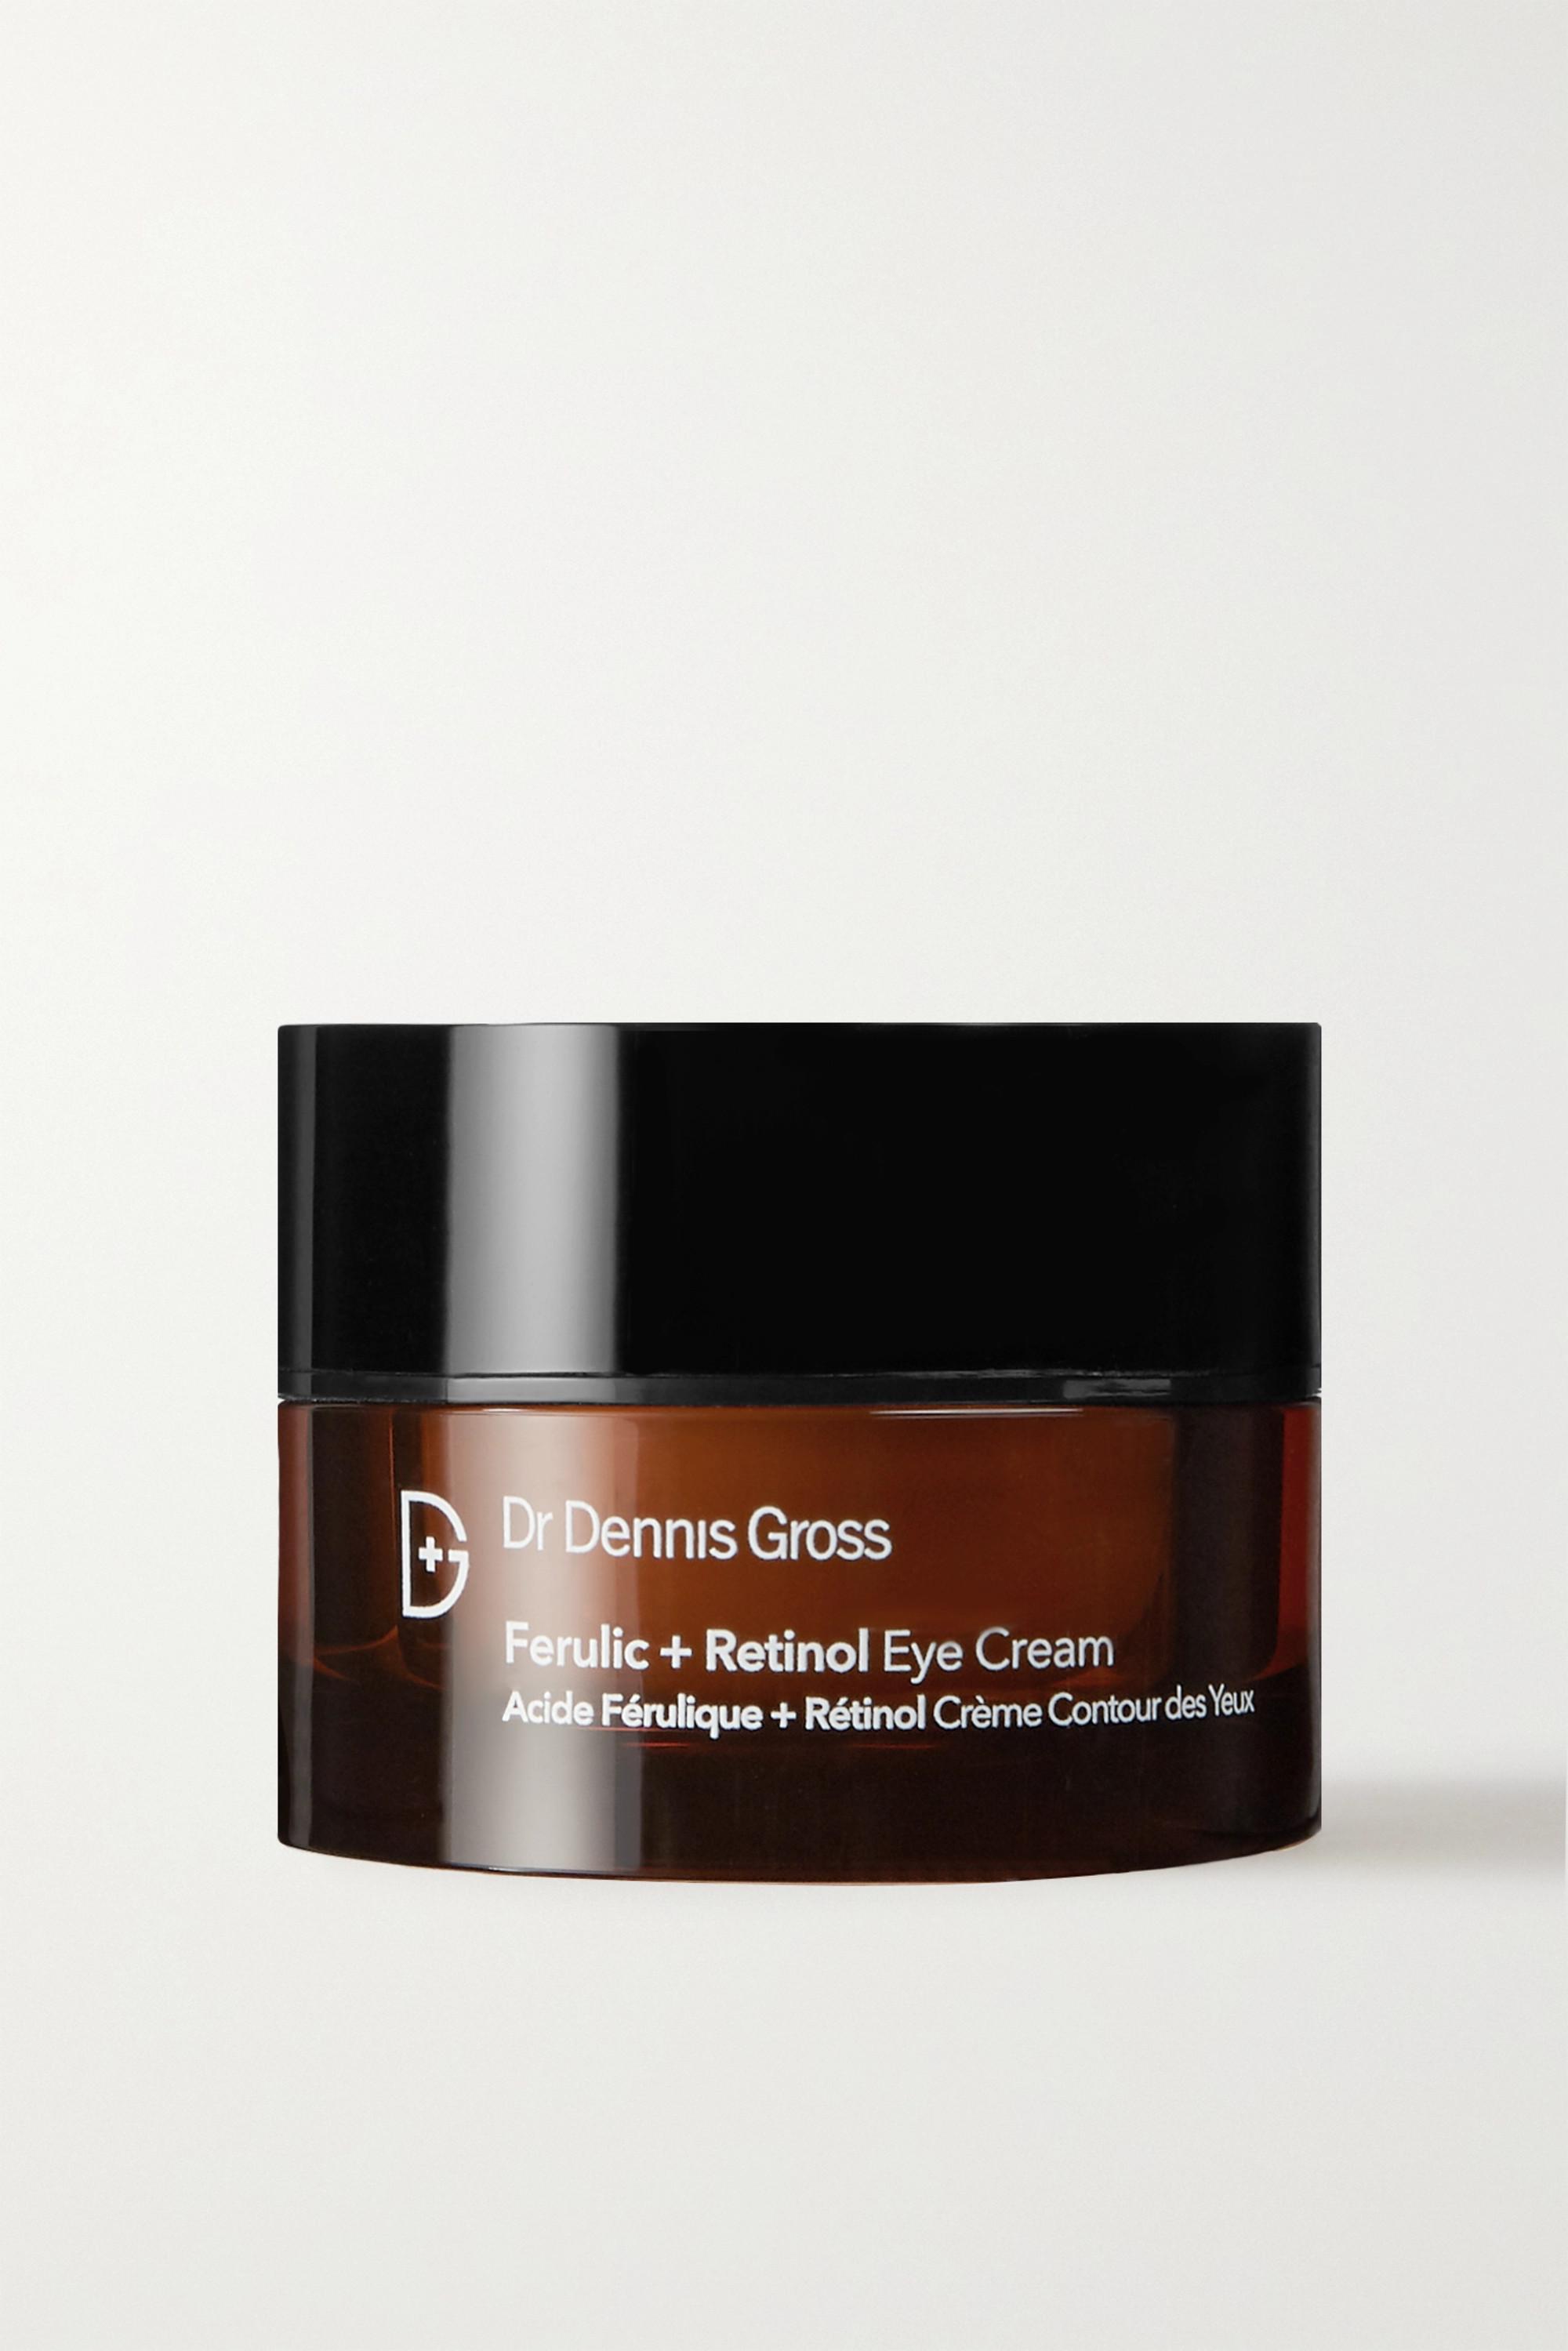 Dr. Dennis Gross Skincare Ferulic + Retinol Eye Cream, 15ml